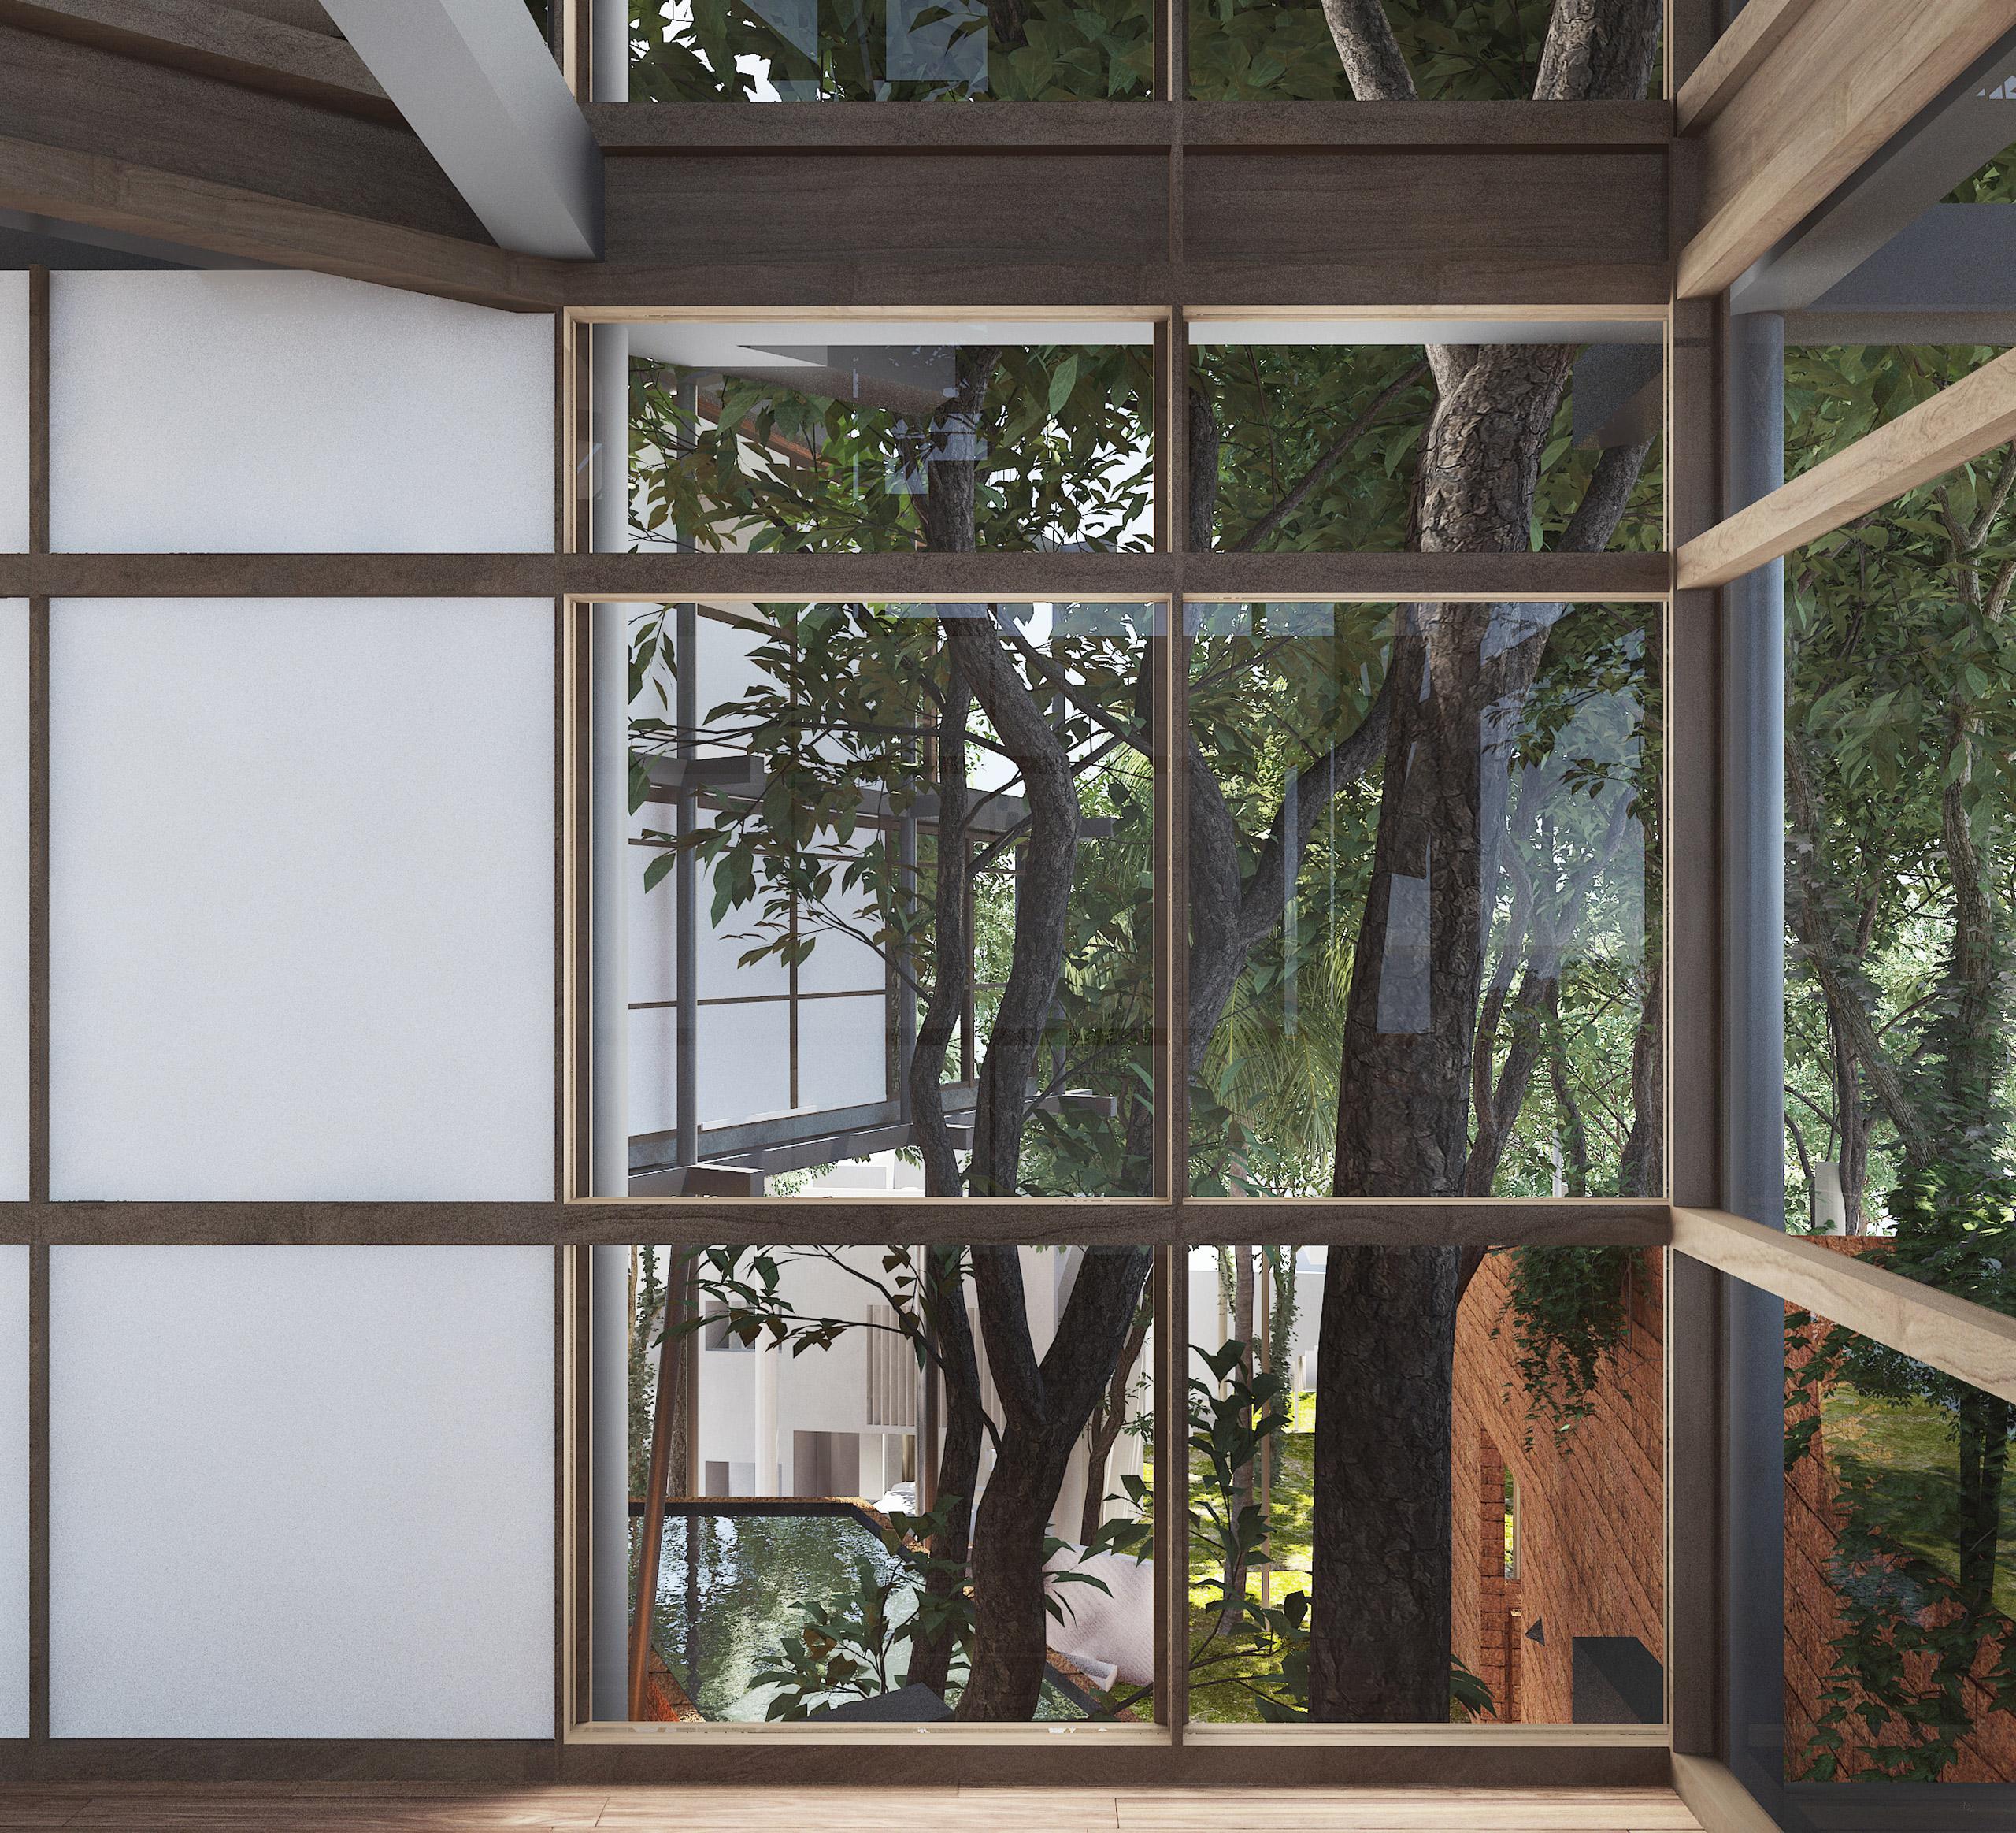 Socorro Goa India Canopy Villa window